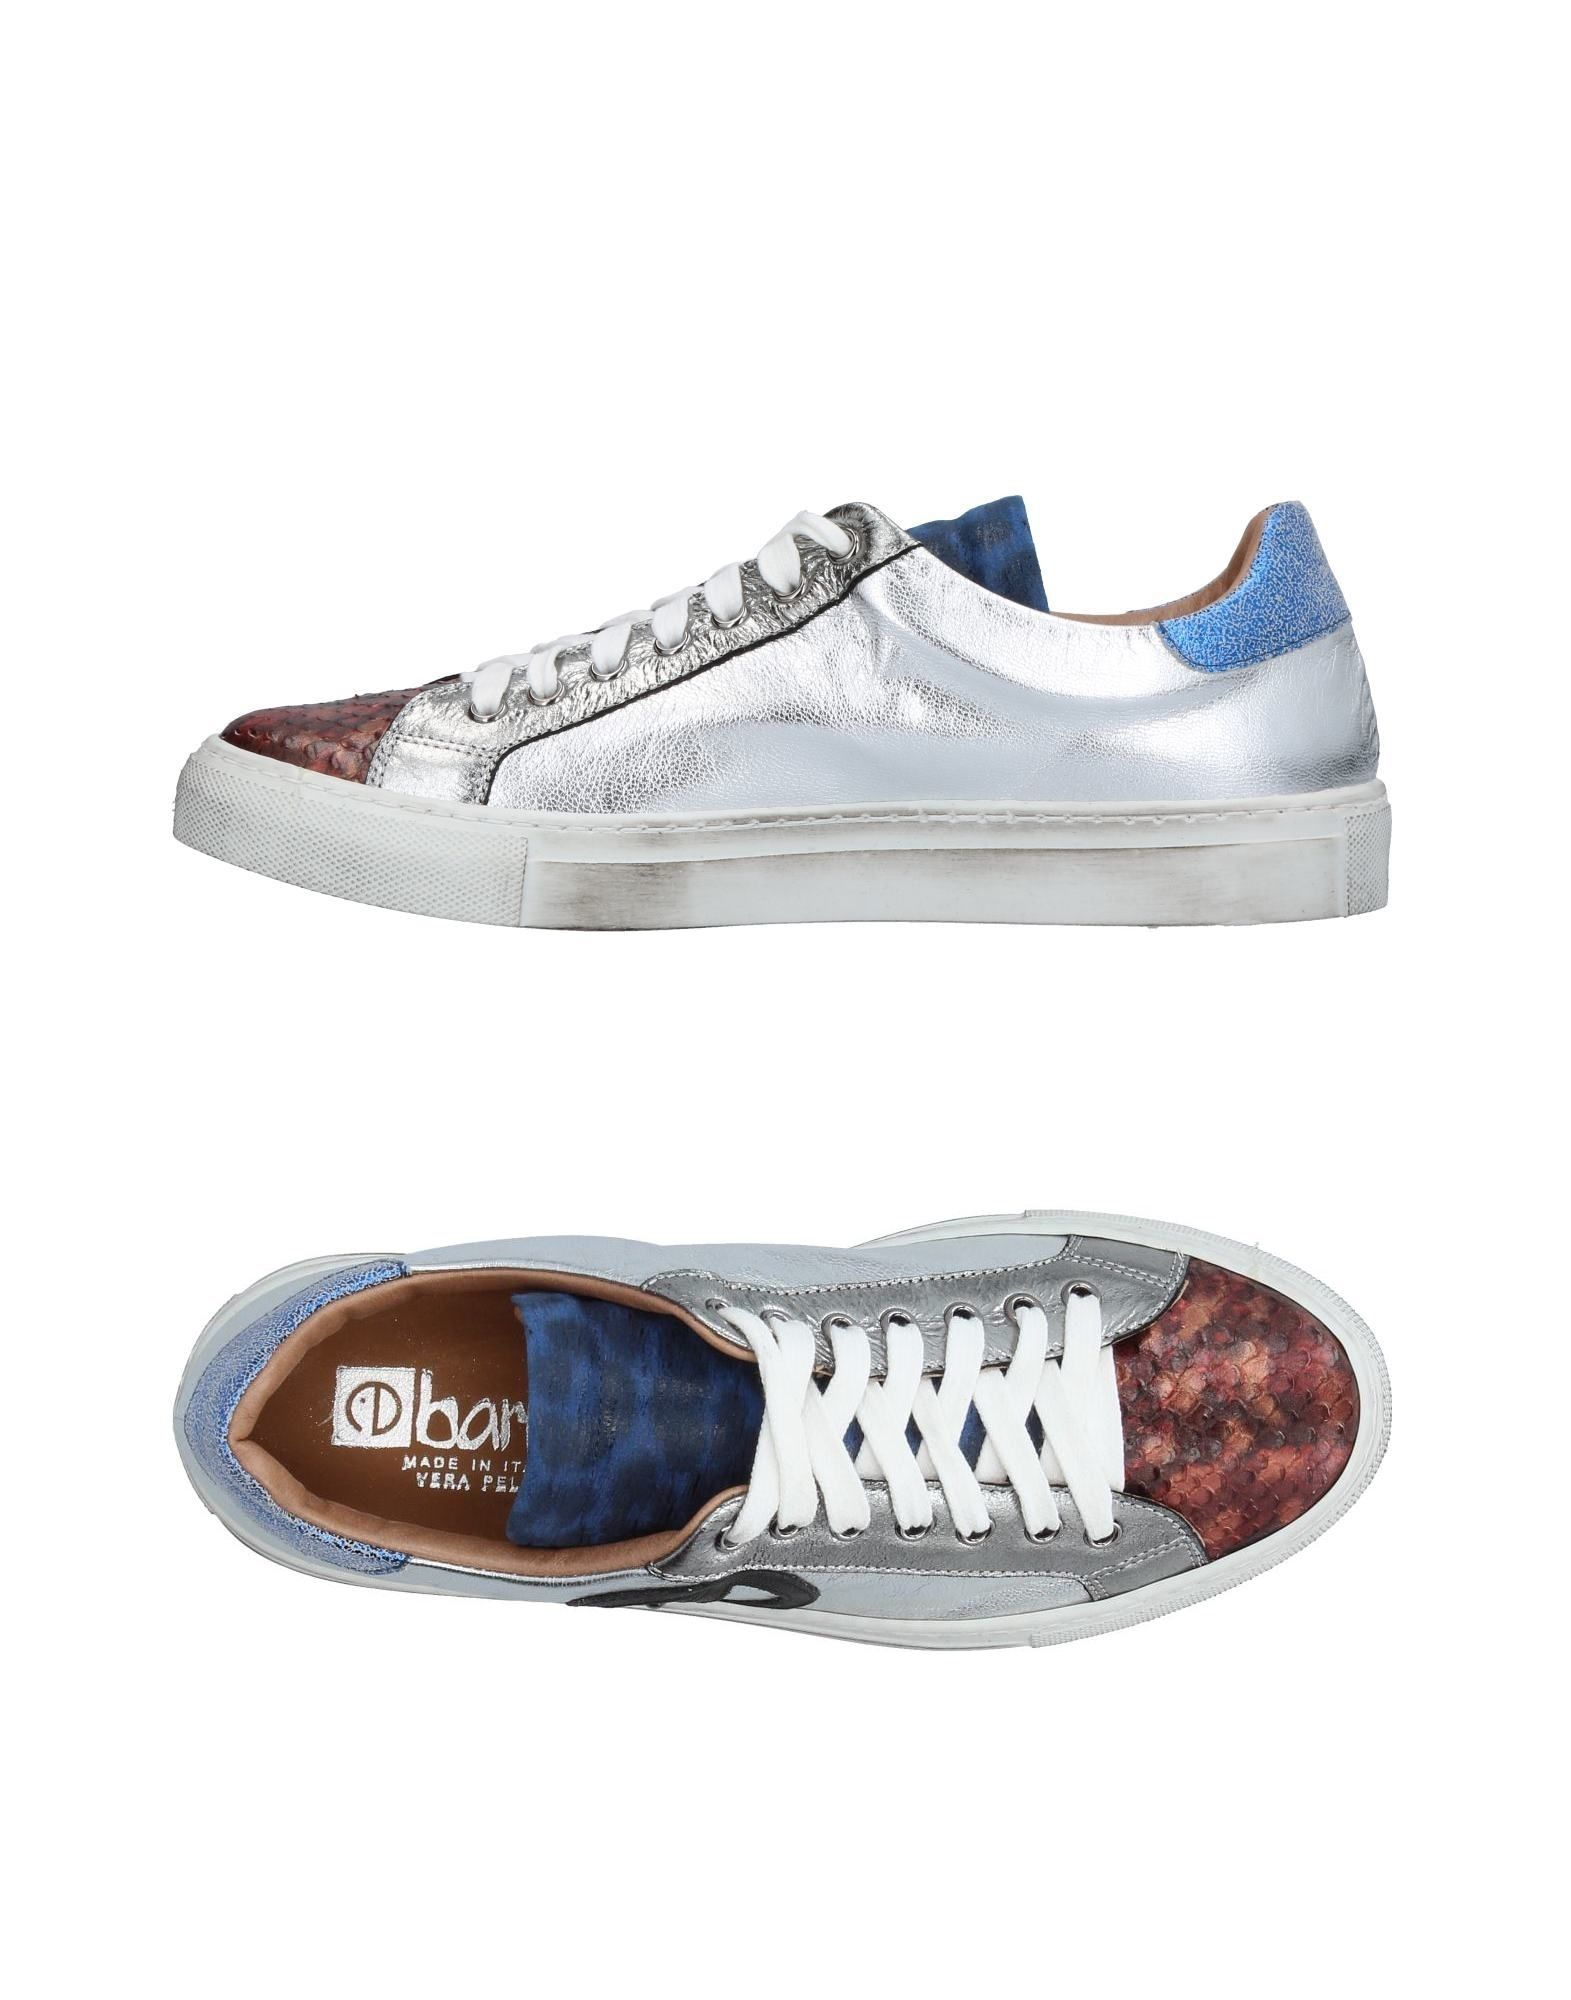 Rabatt echte Schuhe Ebarrito Sneakers Herren Herren Herren  11371683EB 240822